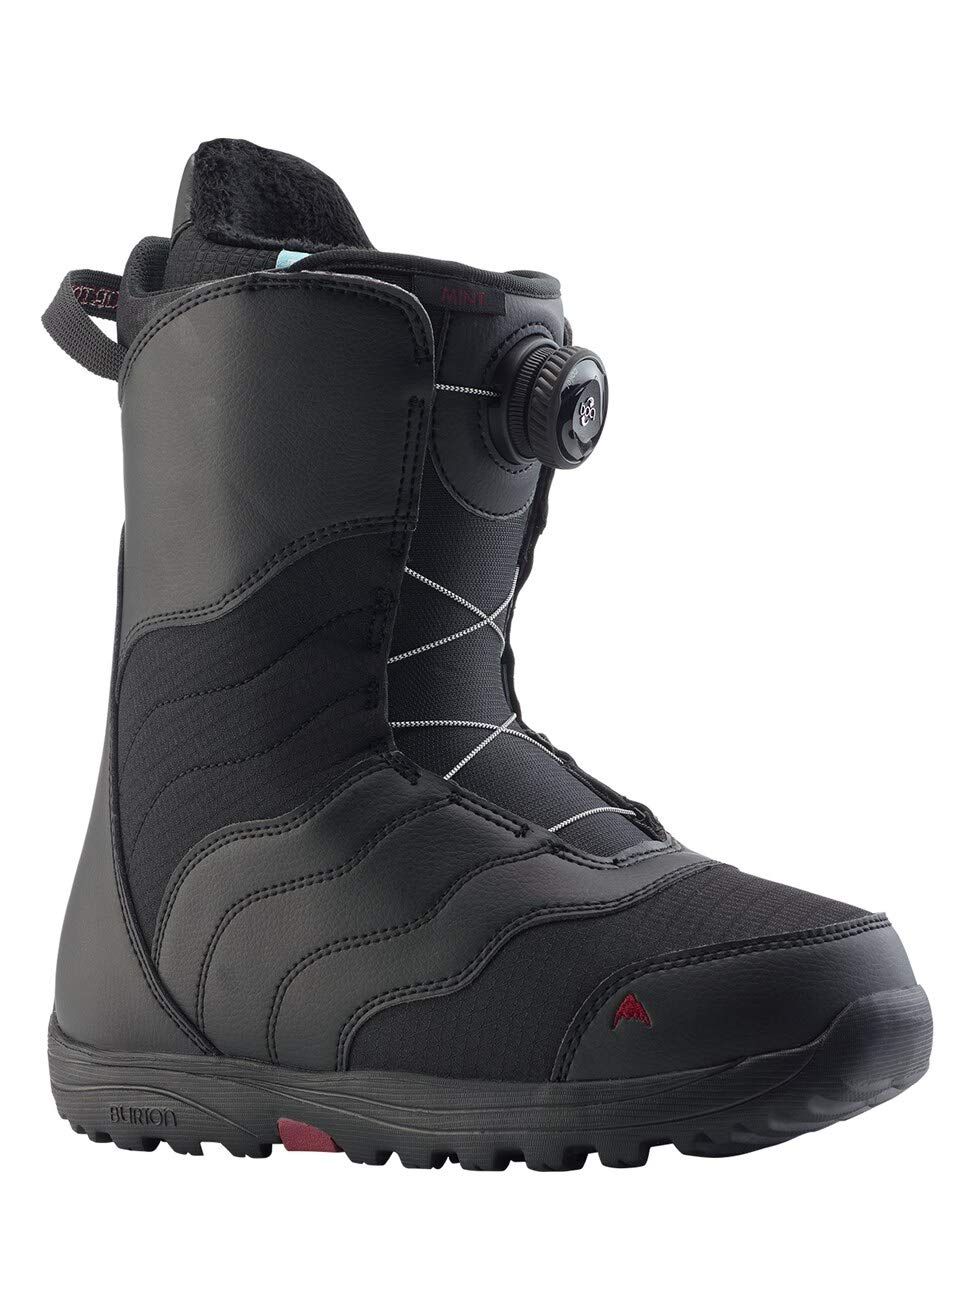 Burton Women's Mint Boa Boots